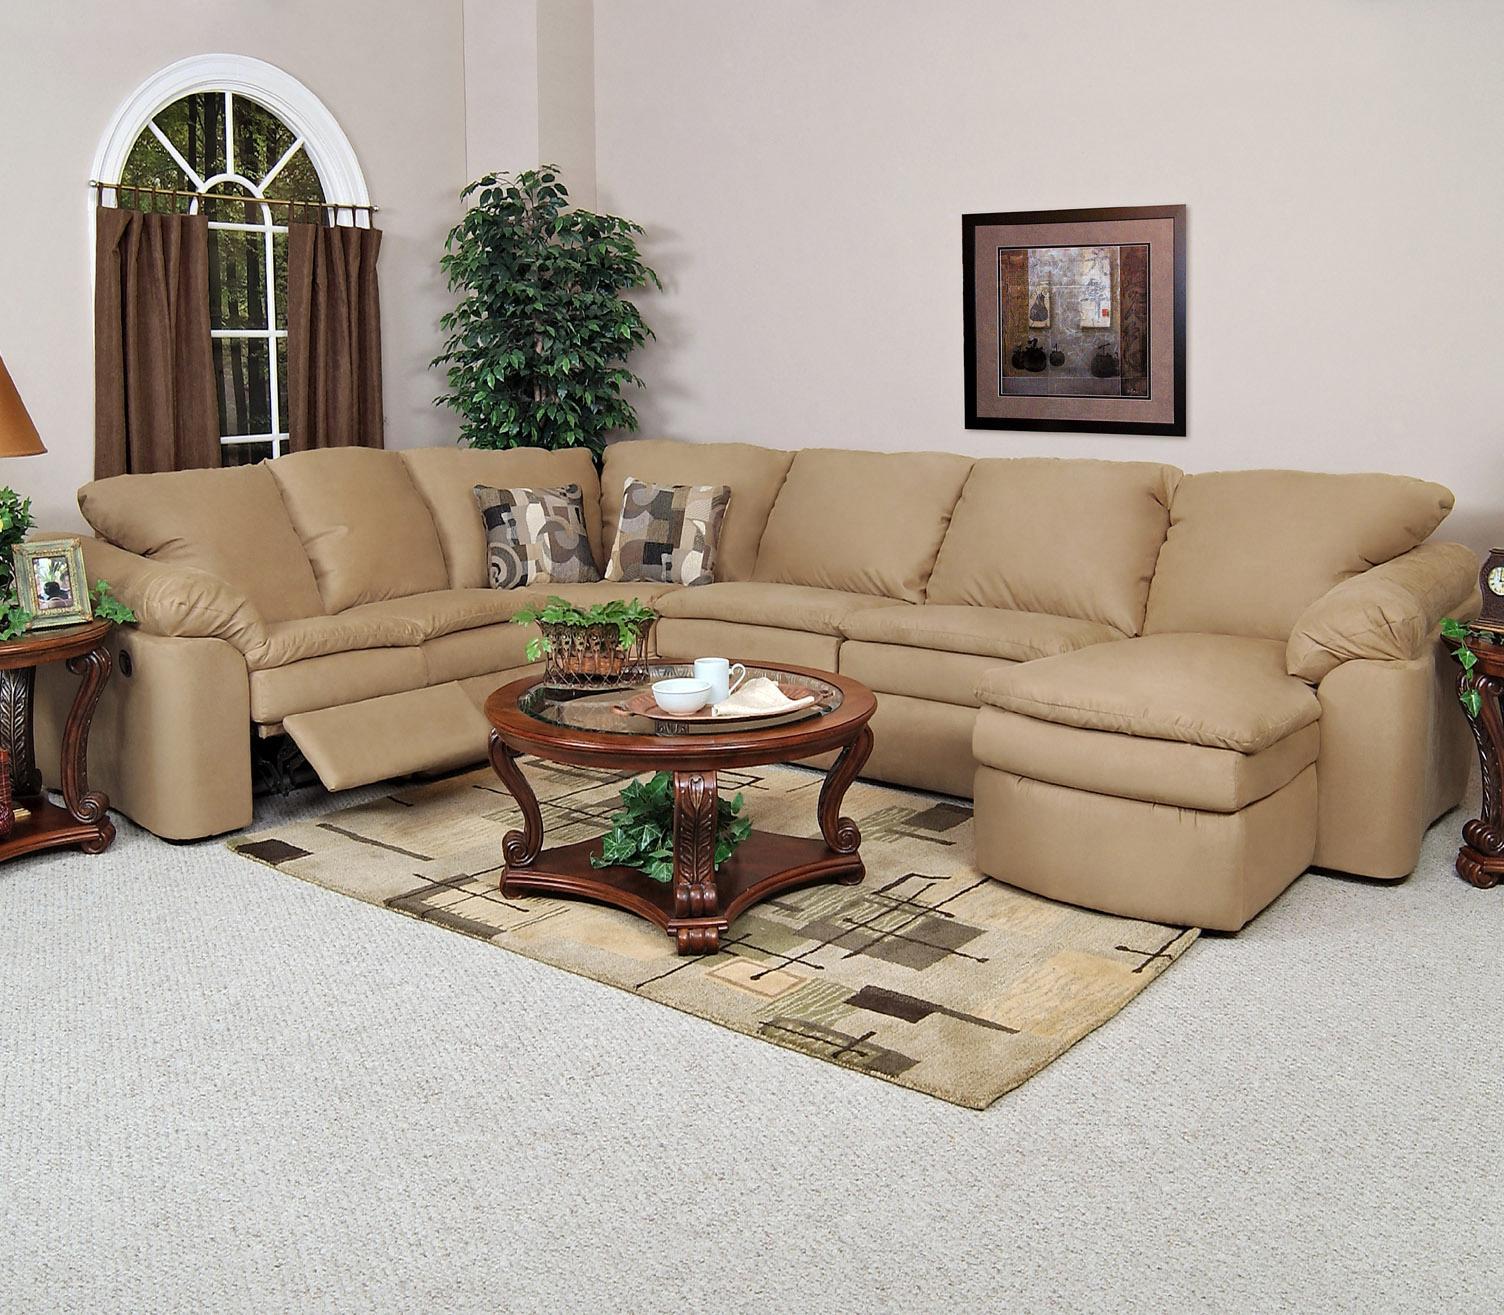 Leather Furniture Vs Microfiber